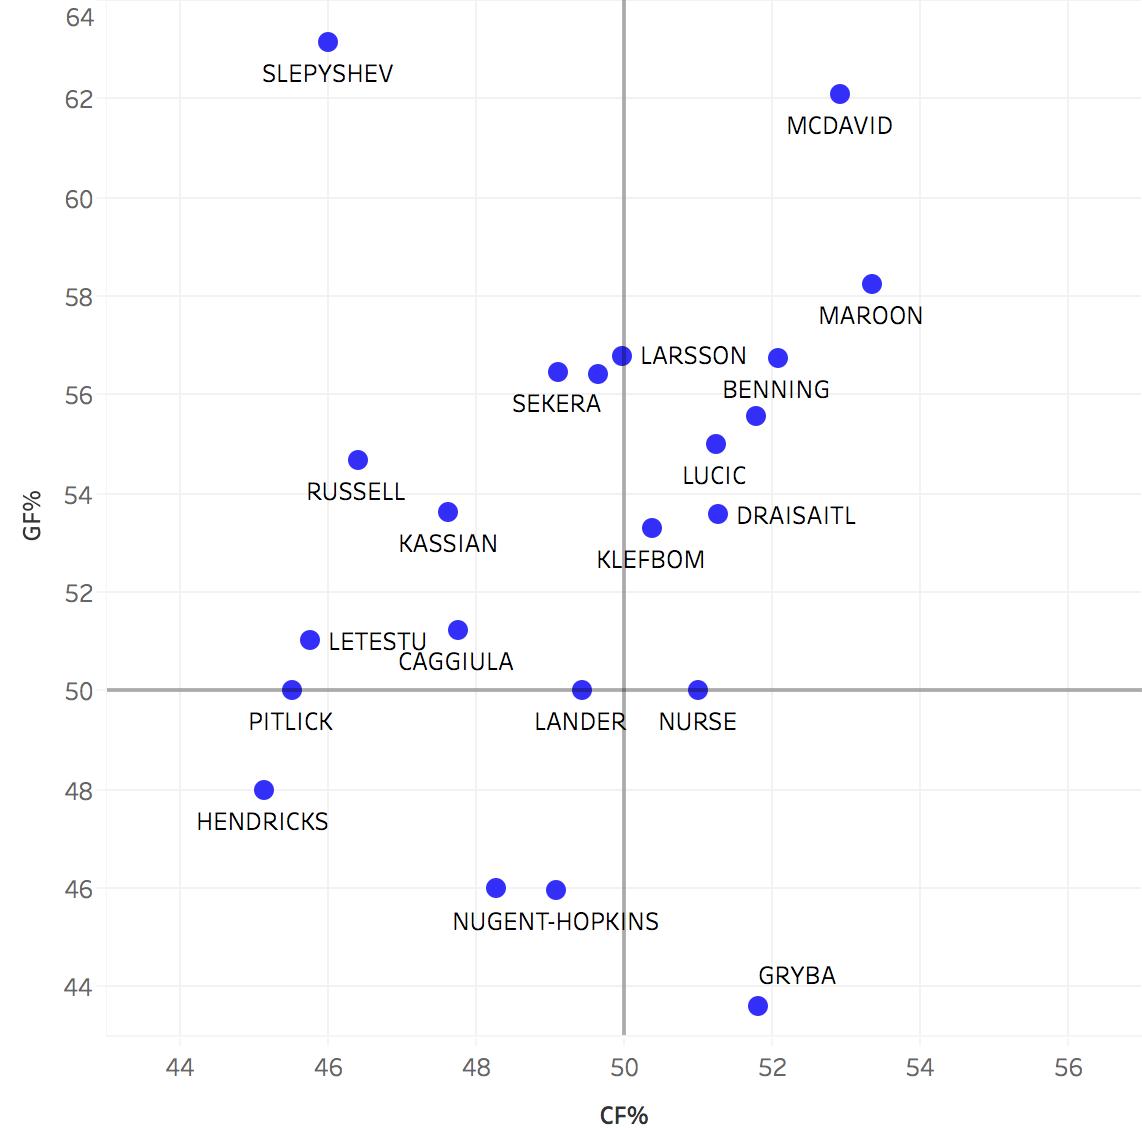 2016-17 Roster - GF% and CF% (no adjustment)